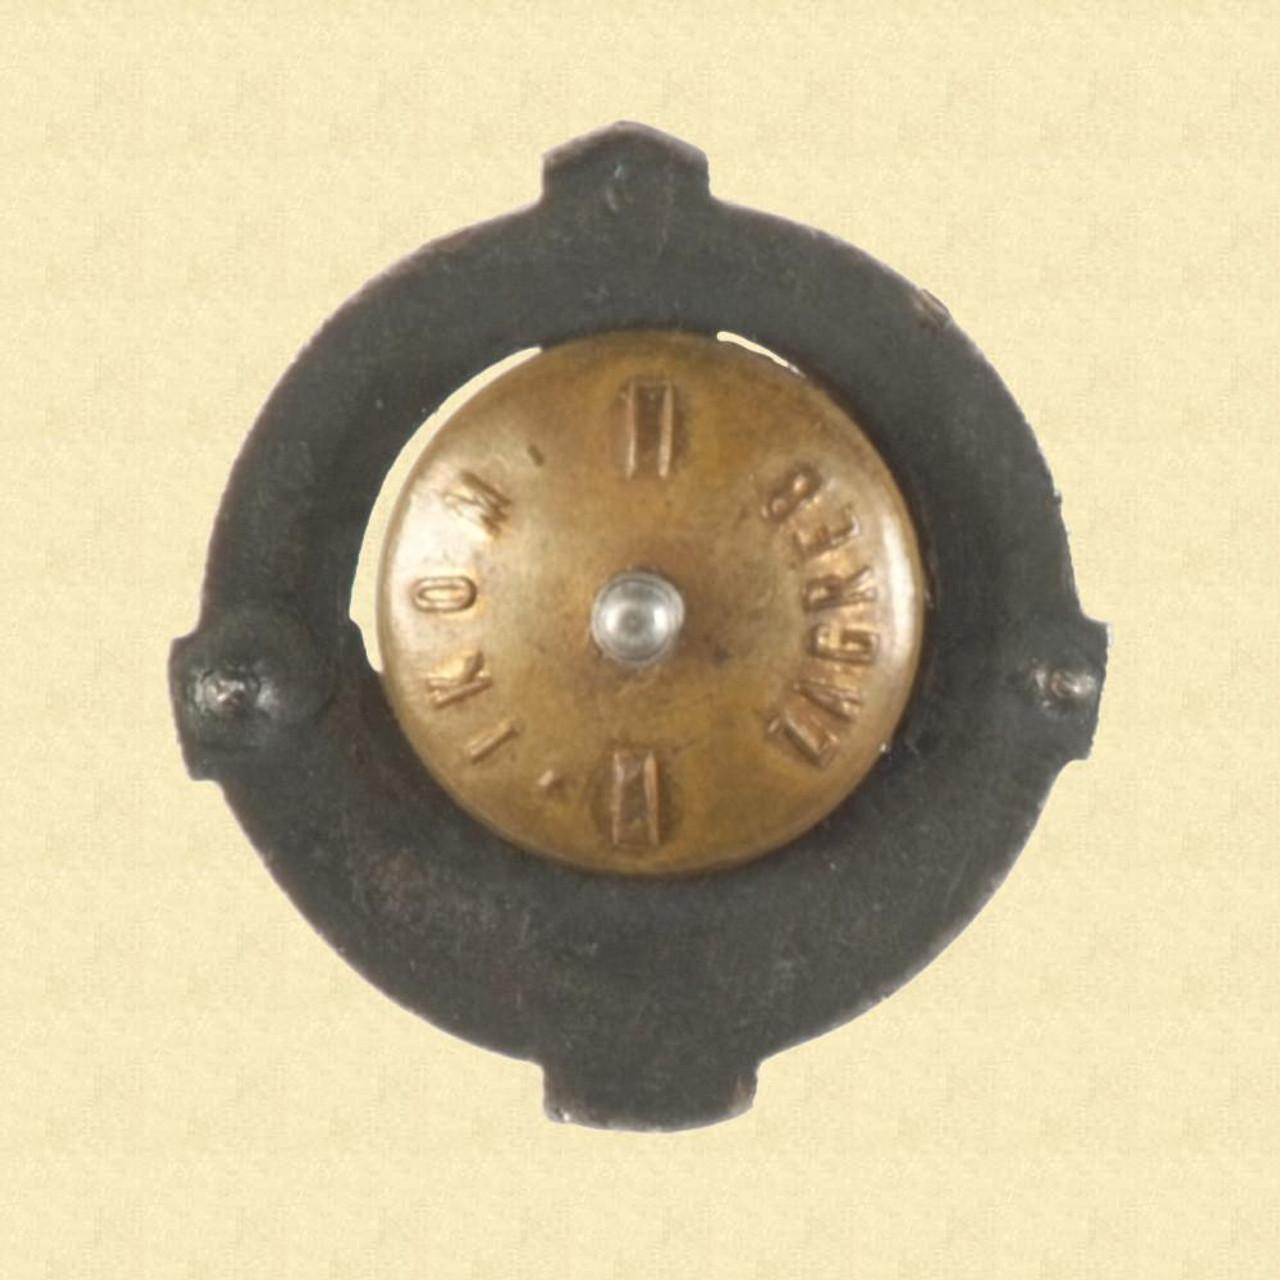 CIVIL MEDAL - C10567